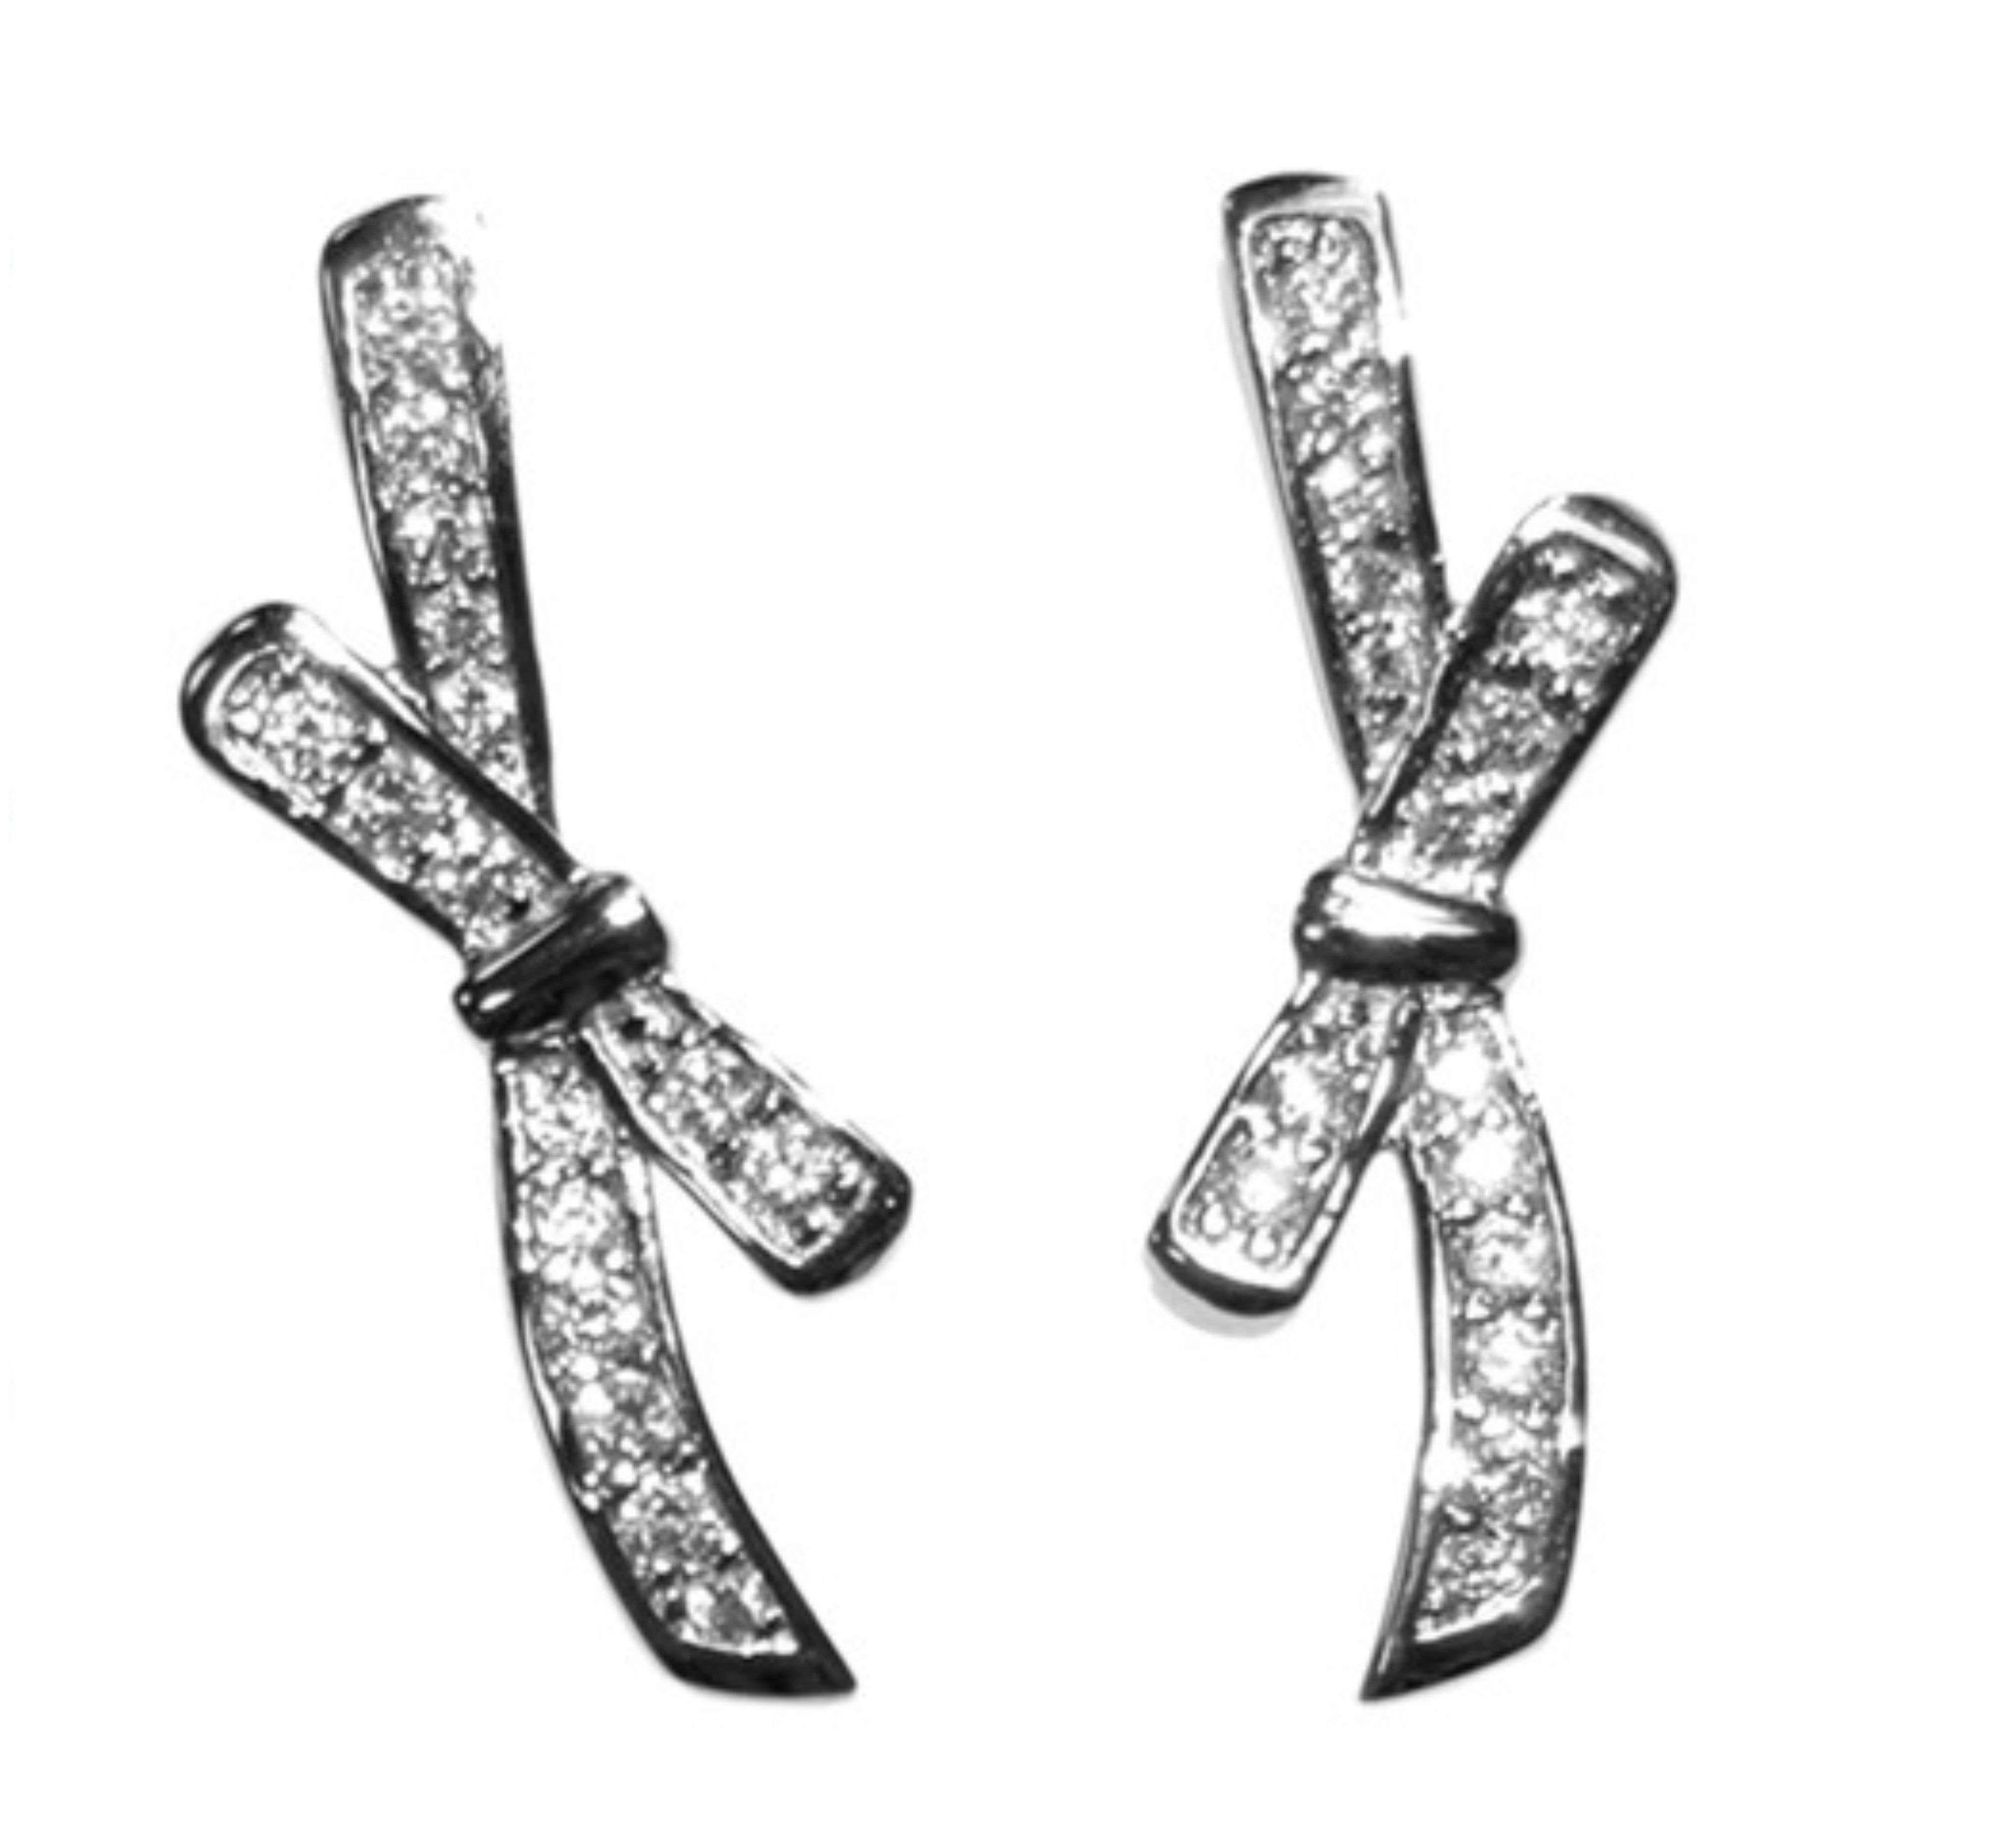 Eulee Round Cut Stud Earrings – 6mm Cubic Zirconia